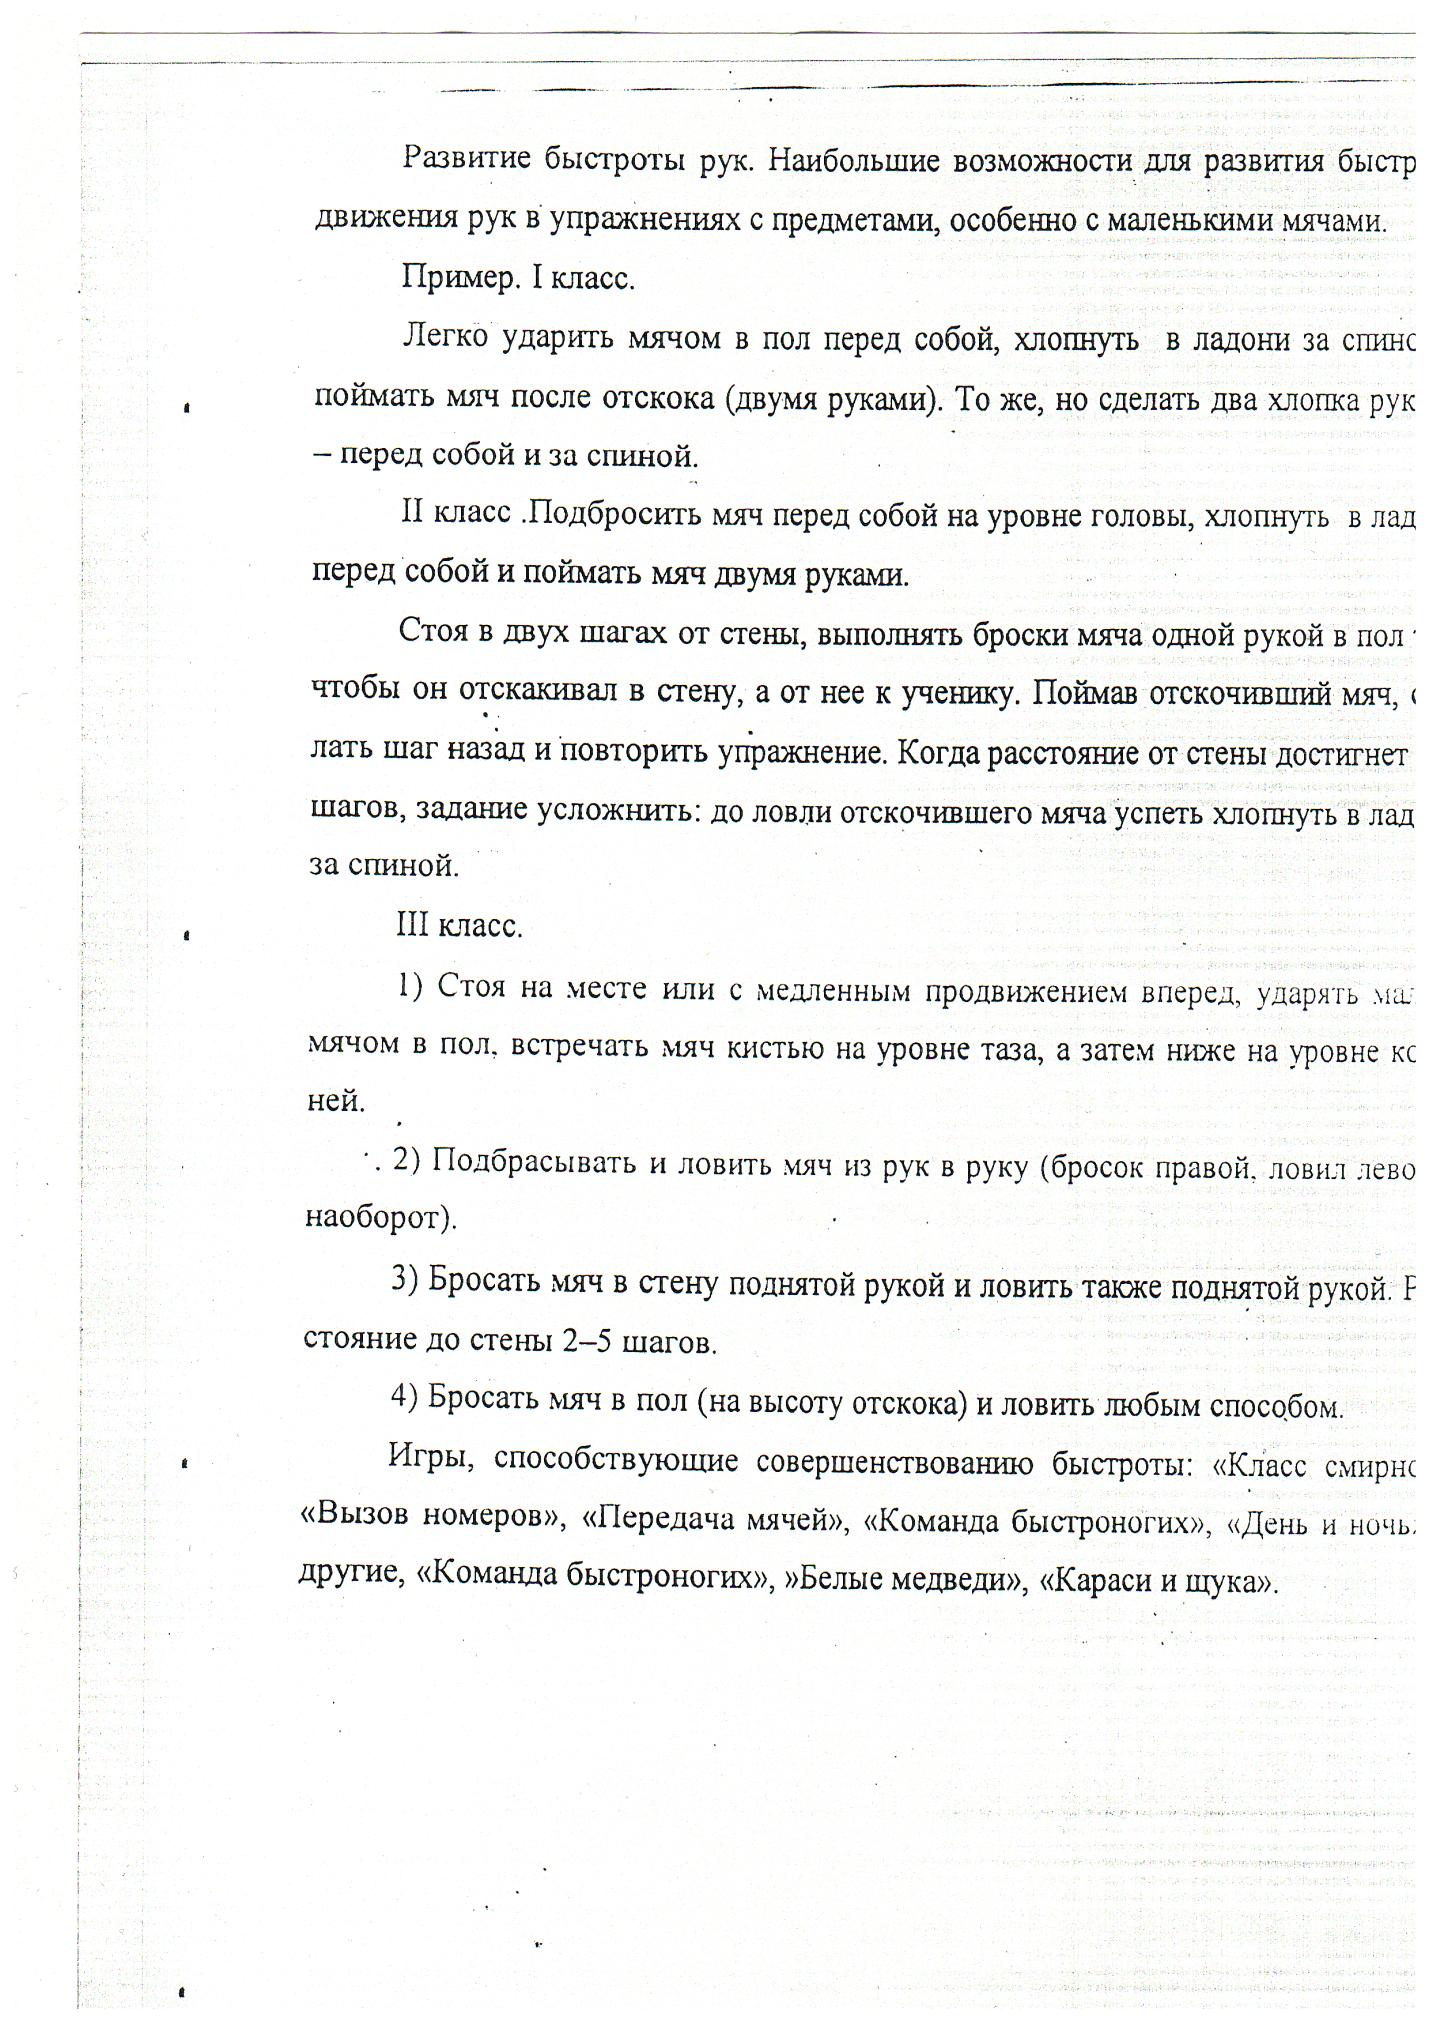 C:\Users\Татьяна\Desktop\12 001.BMP